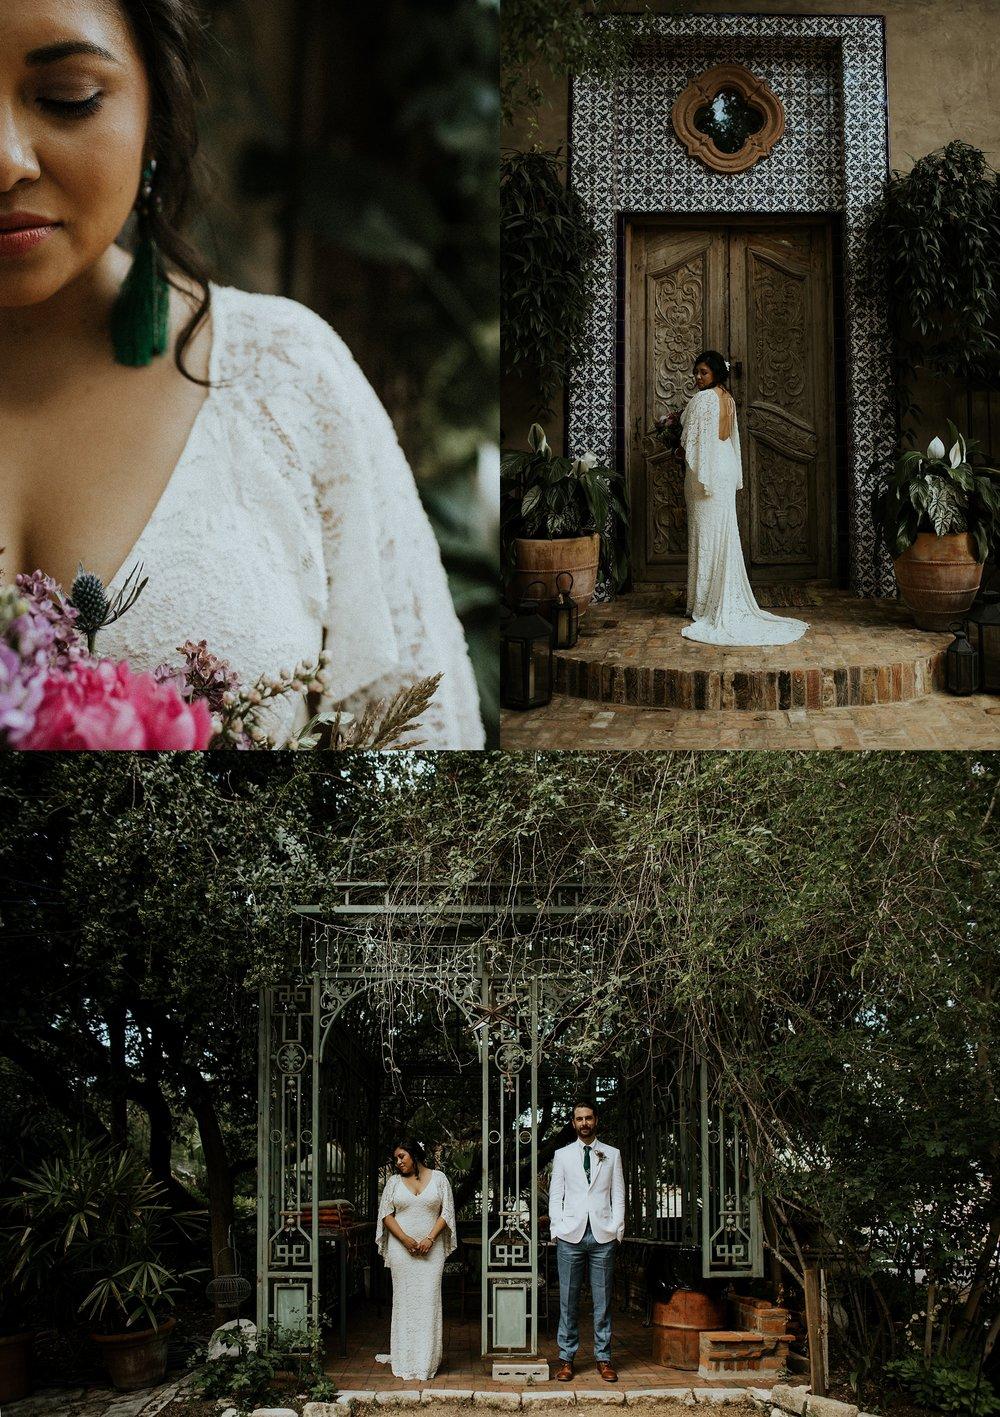 Vibrant Spring Wedding at the enchanting Jennifer's Gardens in Downtown Austin Texas_0017.jpg